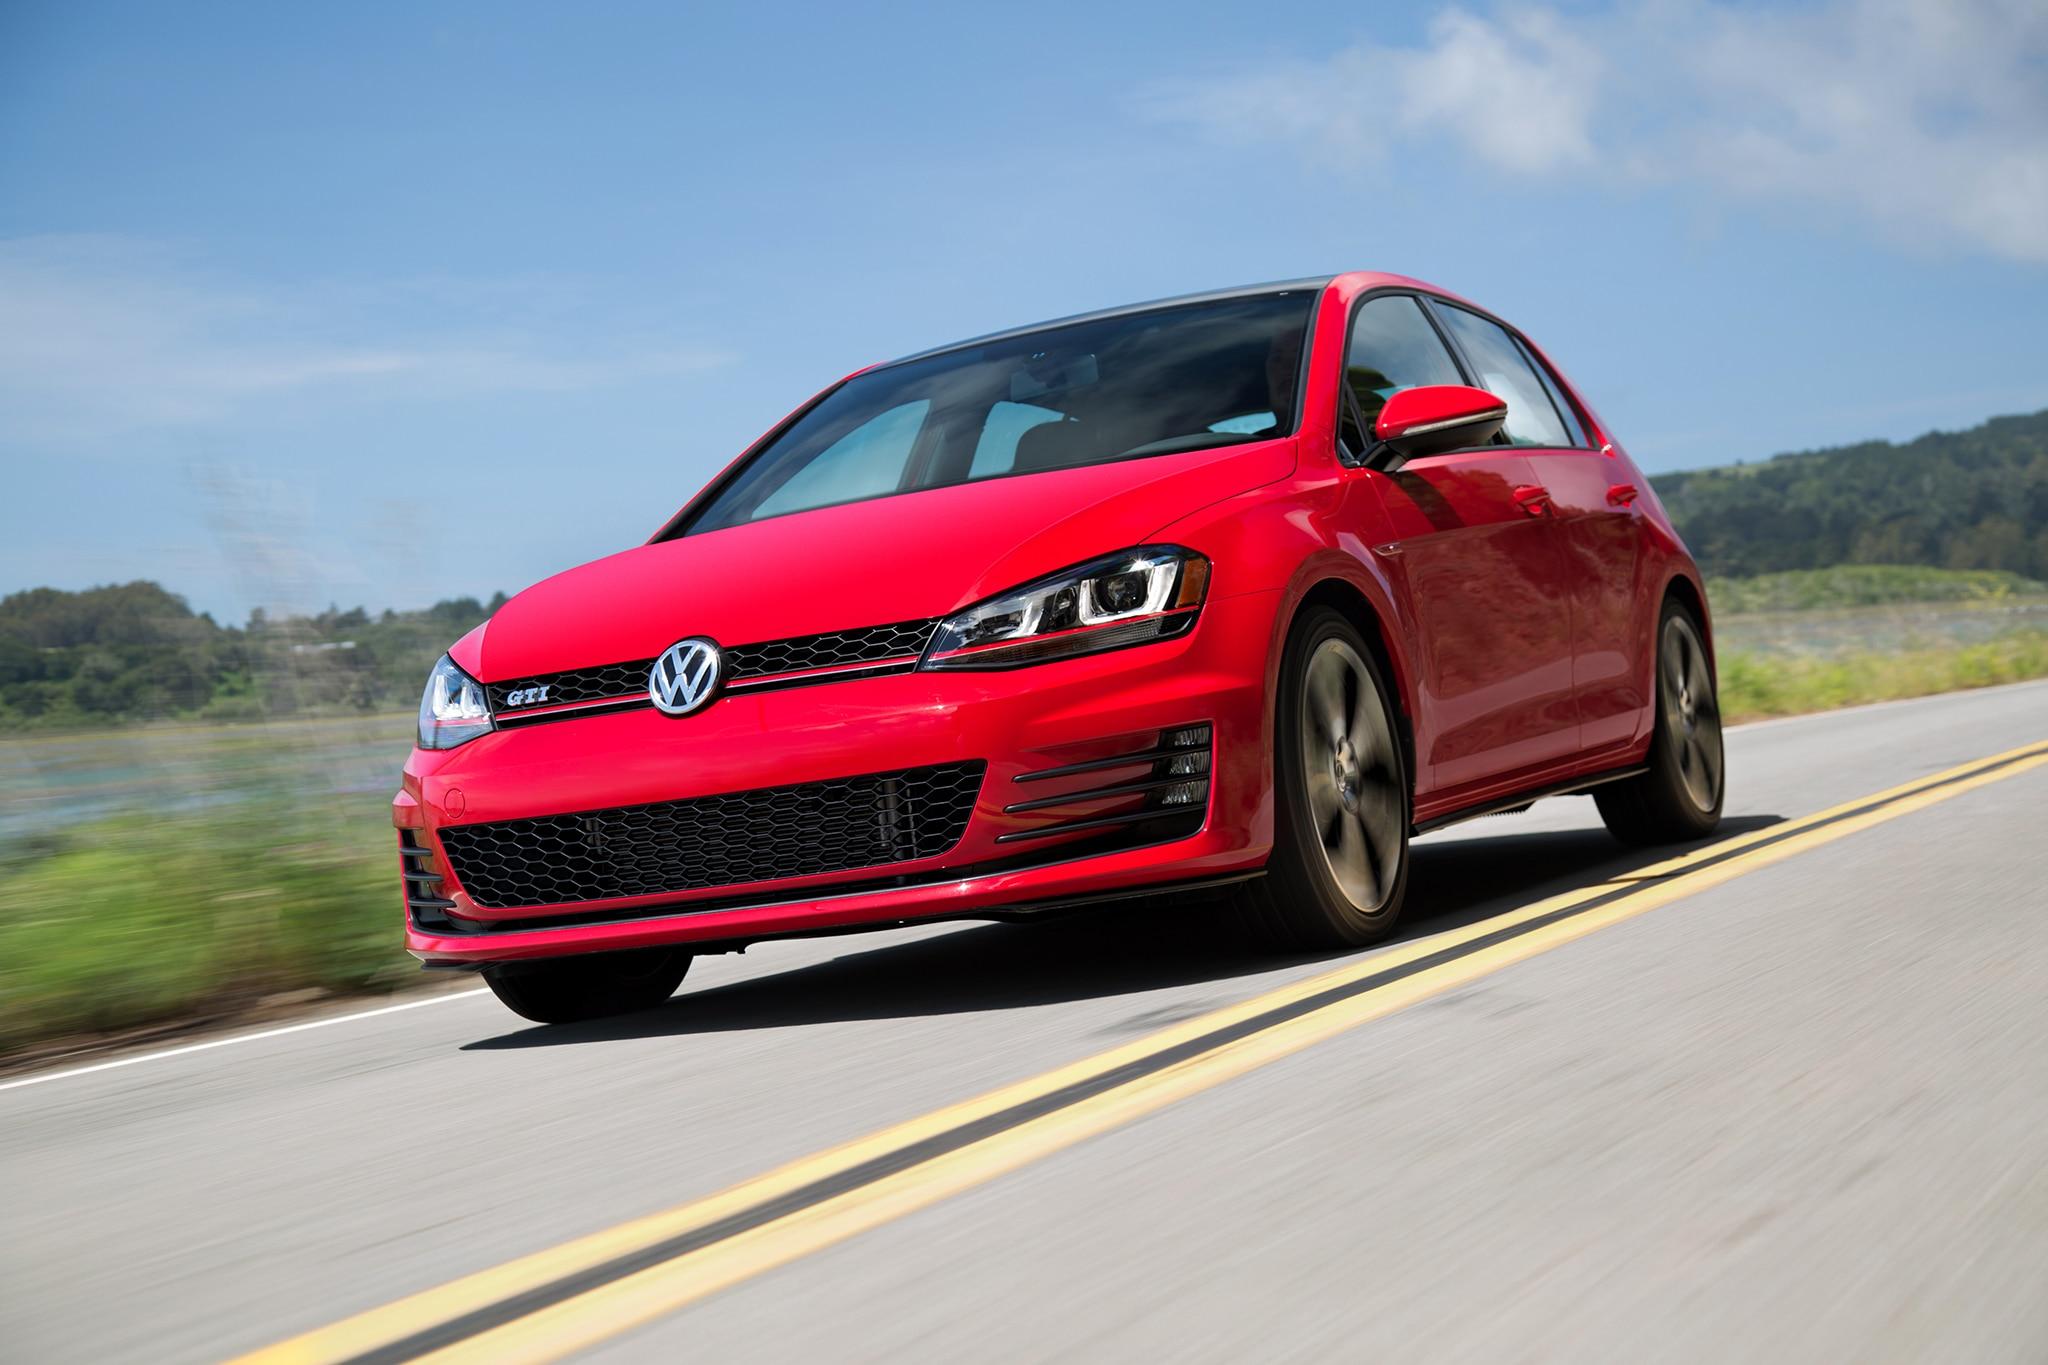 2016 Volkswagen GTI Front Three Quarter In Motion 03